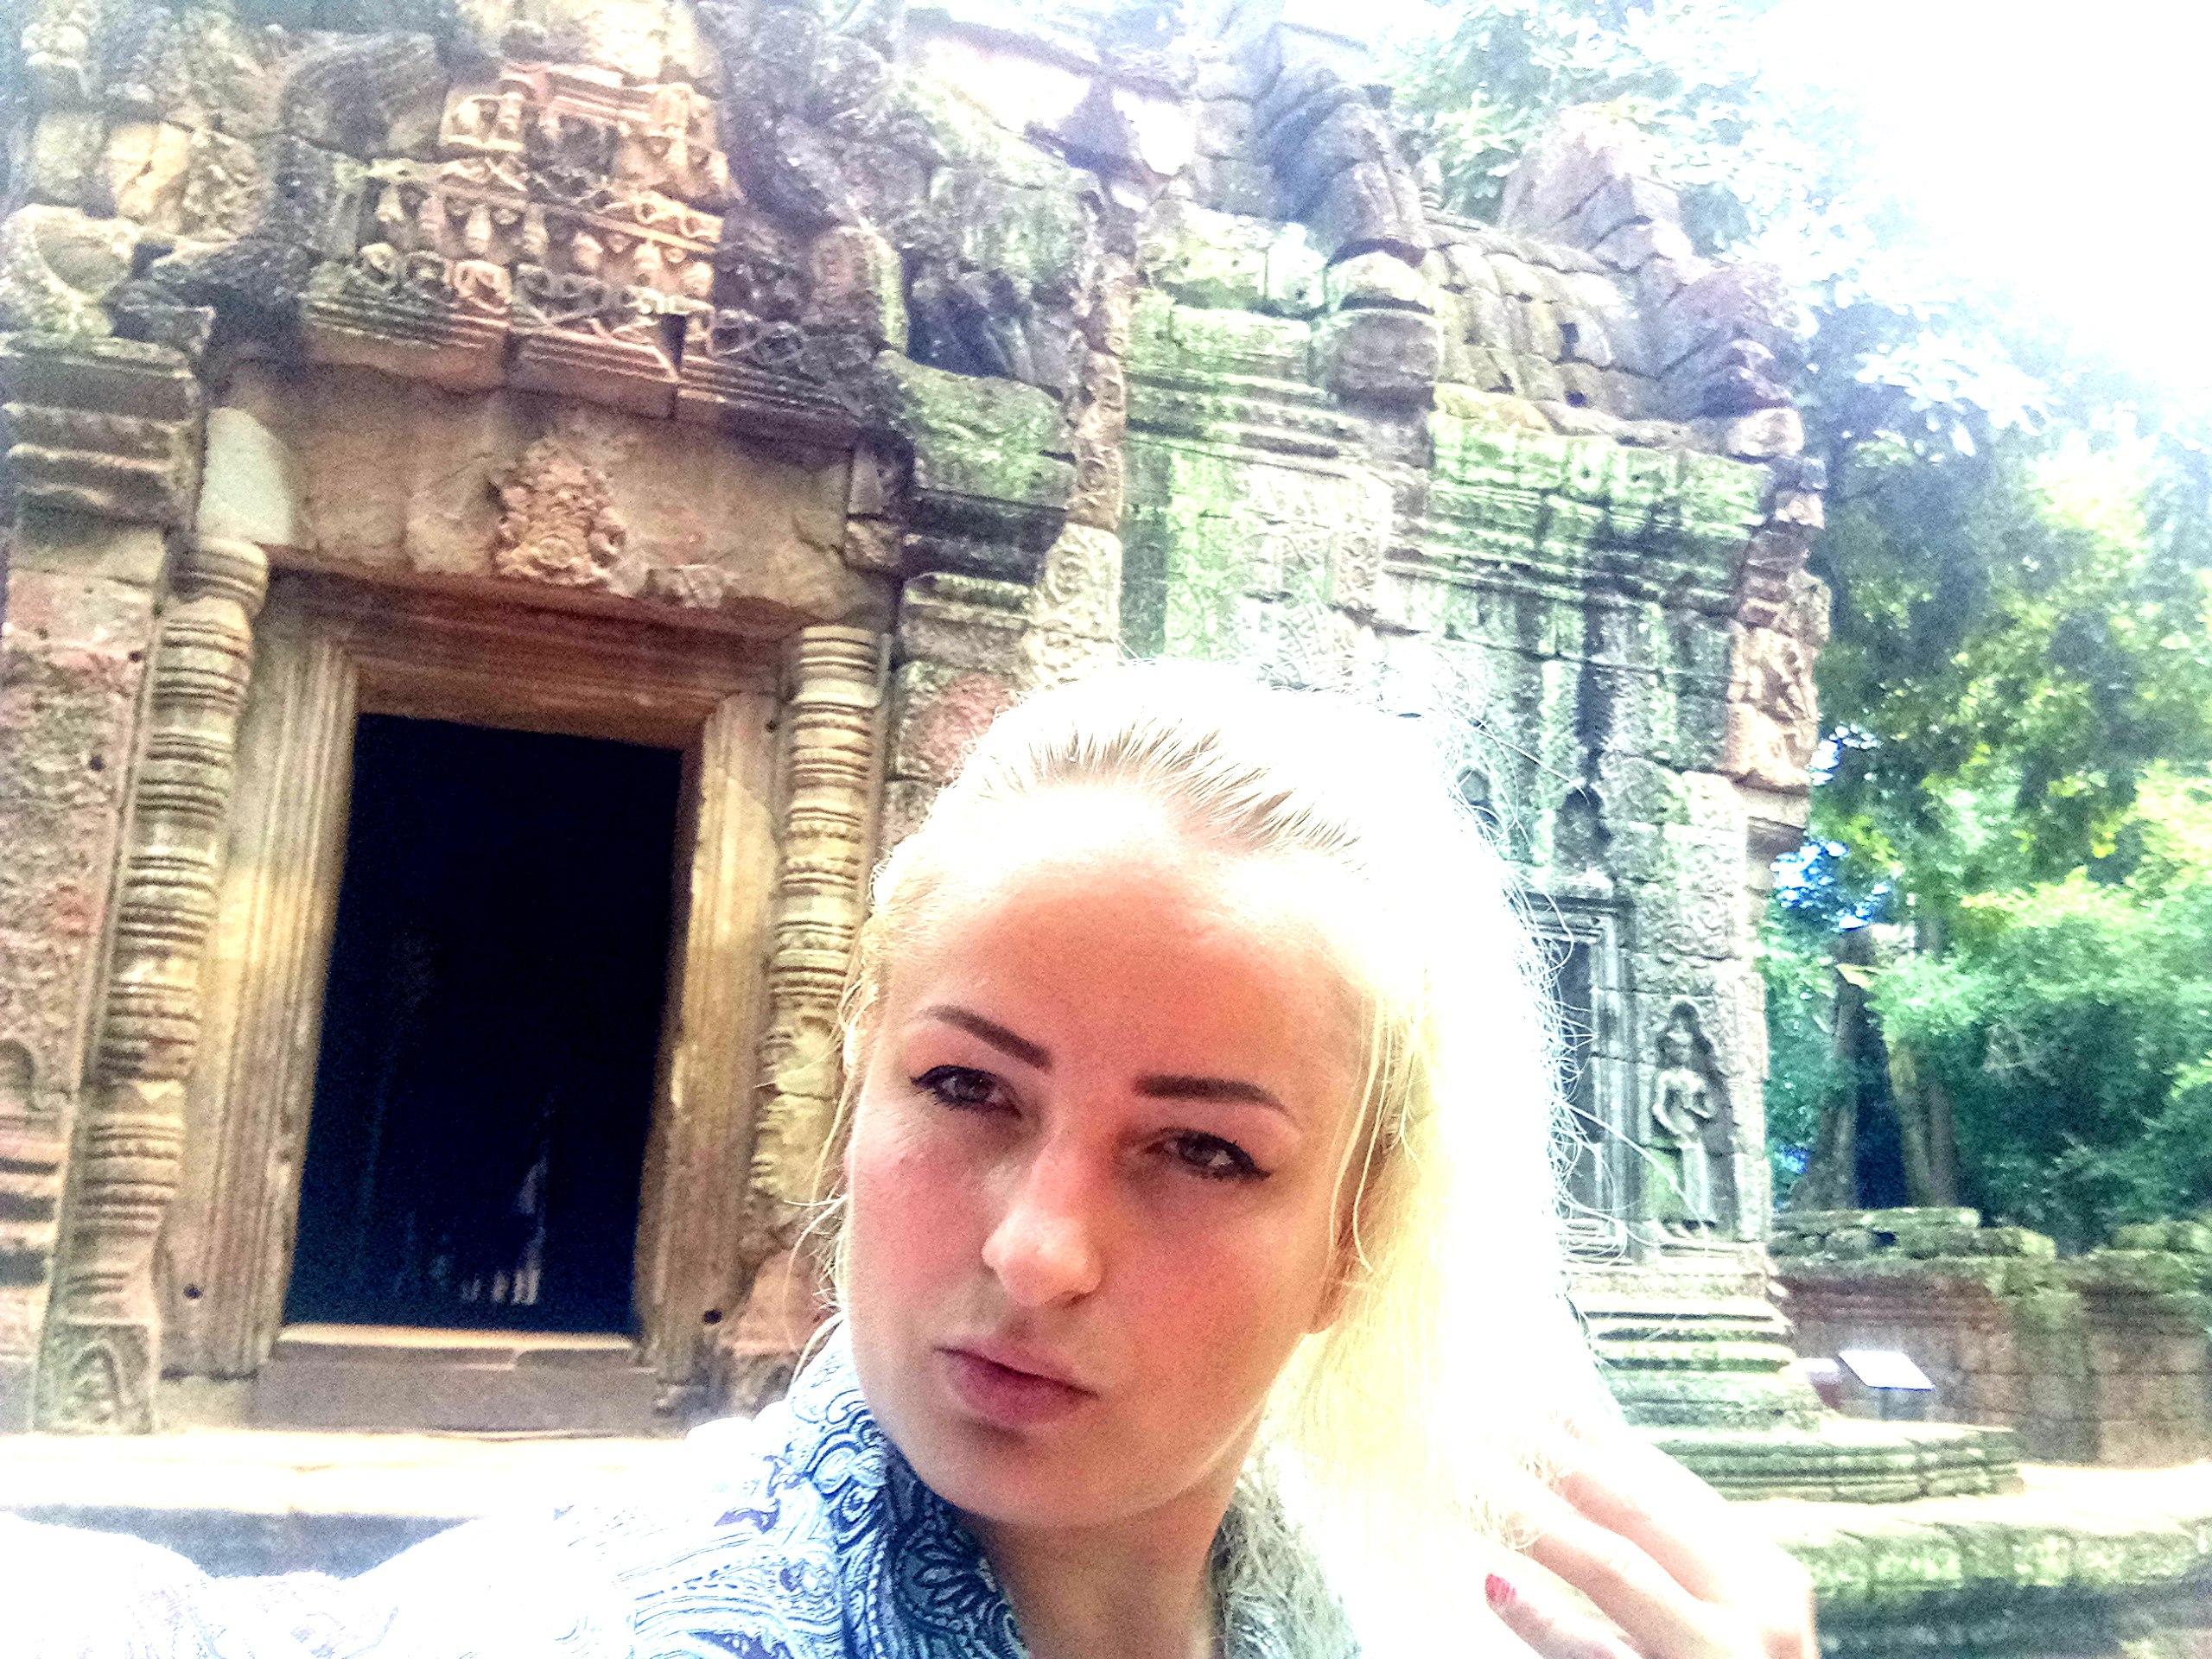 Елена Руденко (Валтея). Камбоджа. Ангкор. - Страница 3 Dmhy4b6e0xg